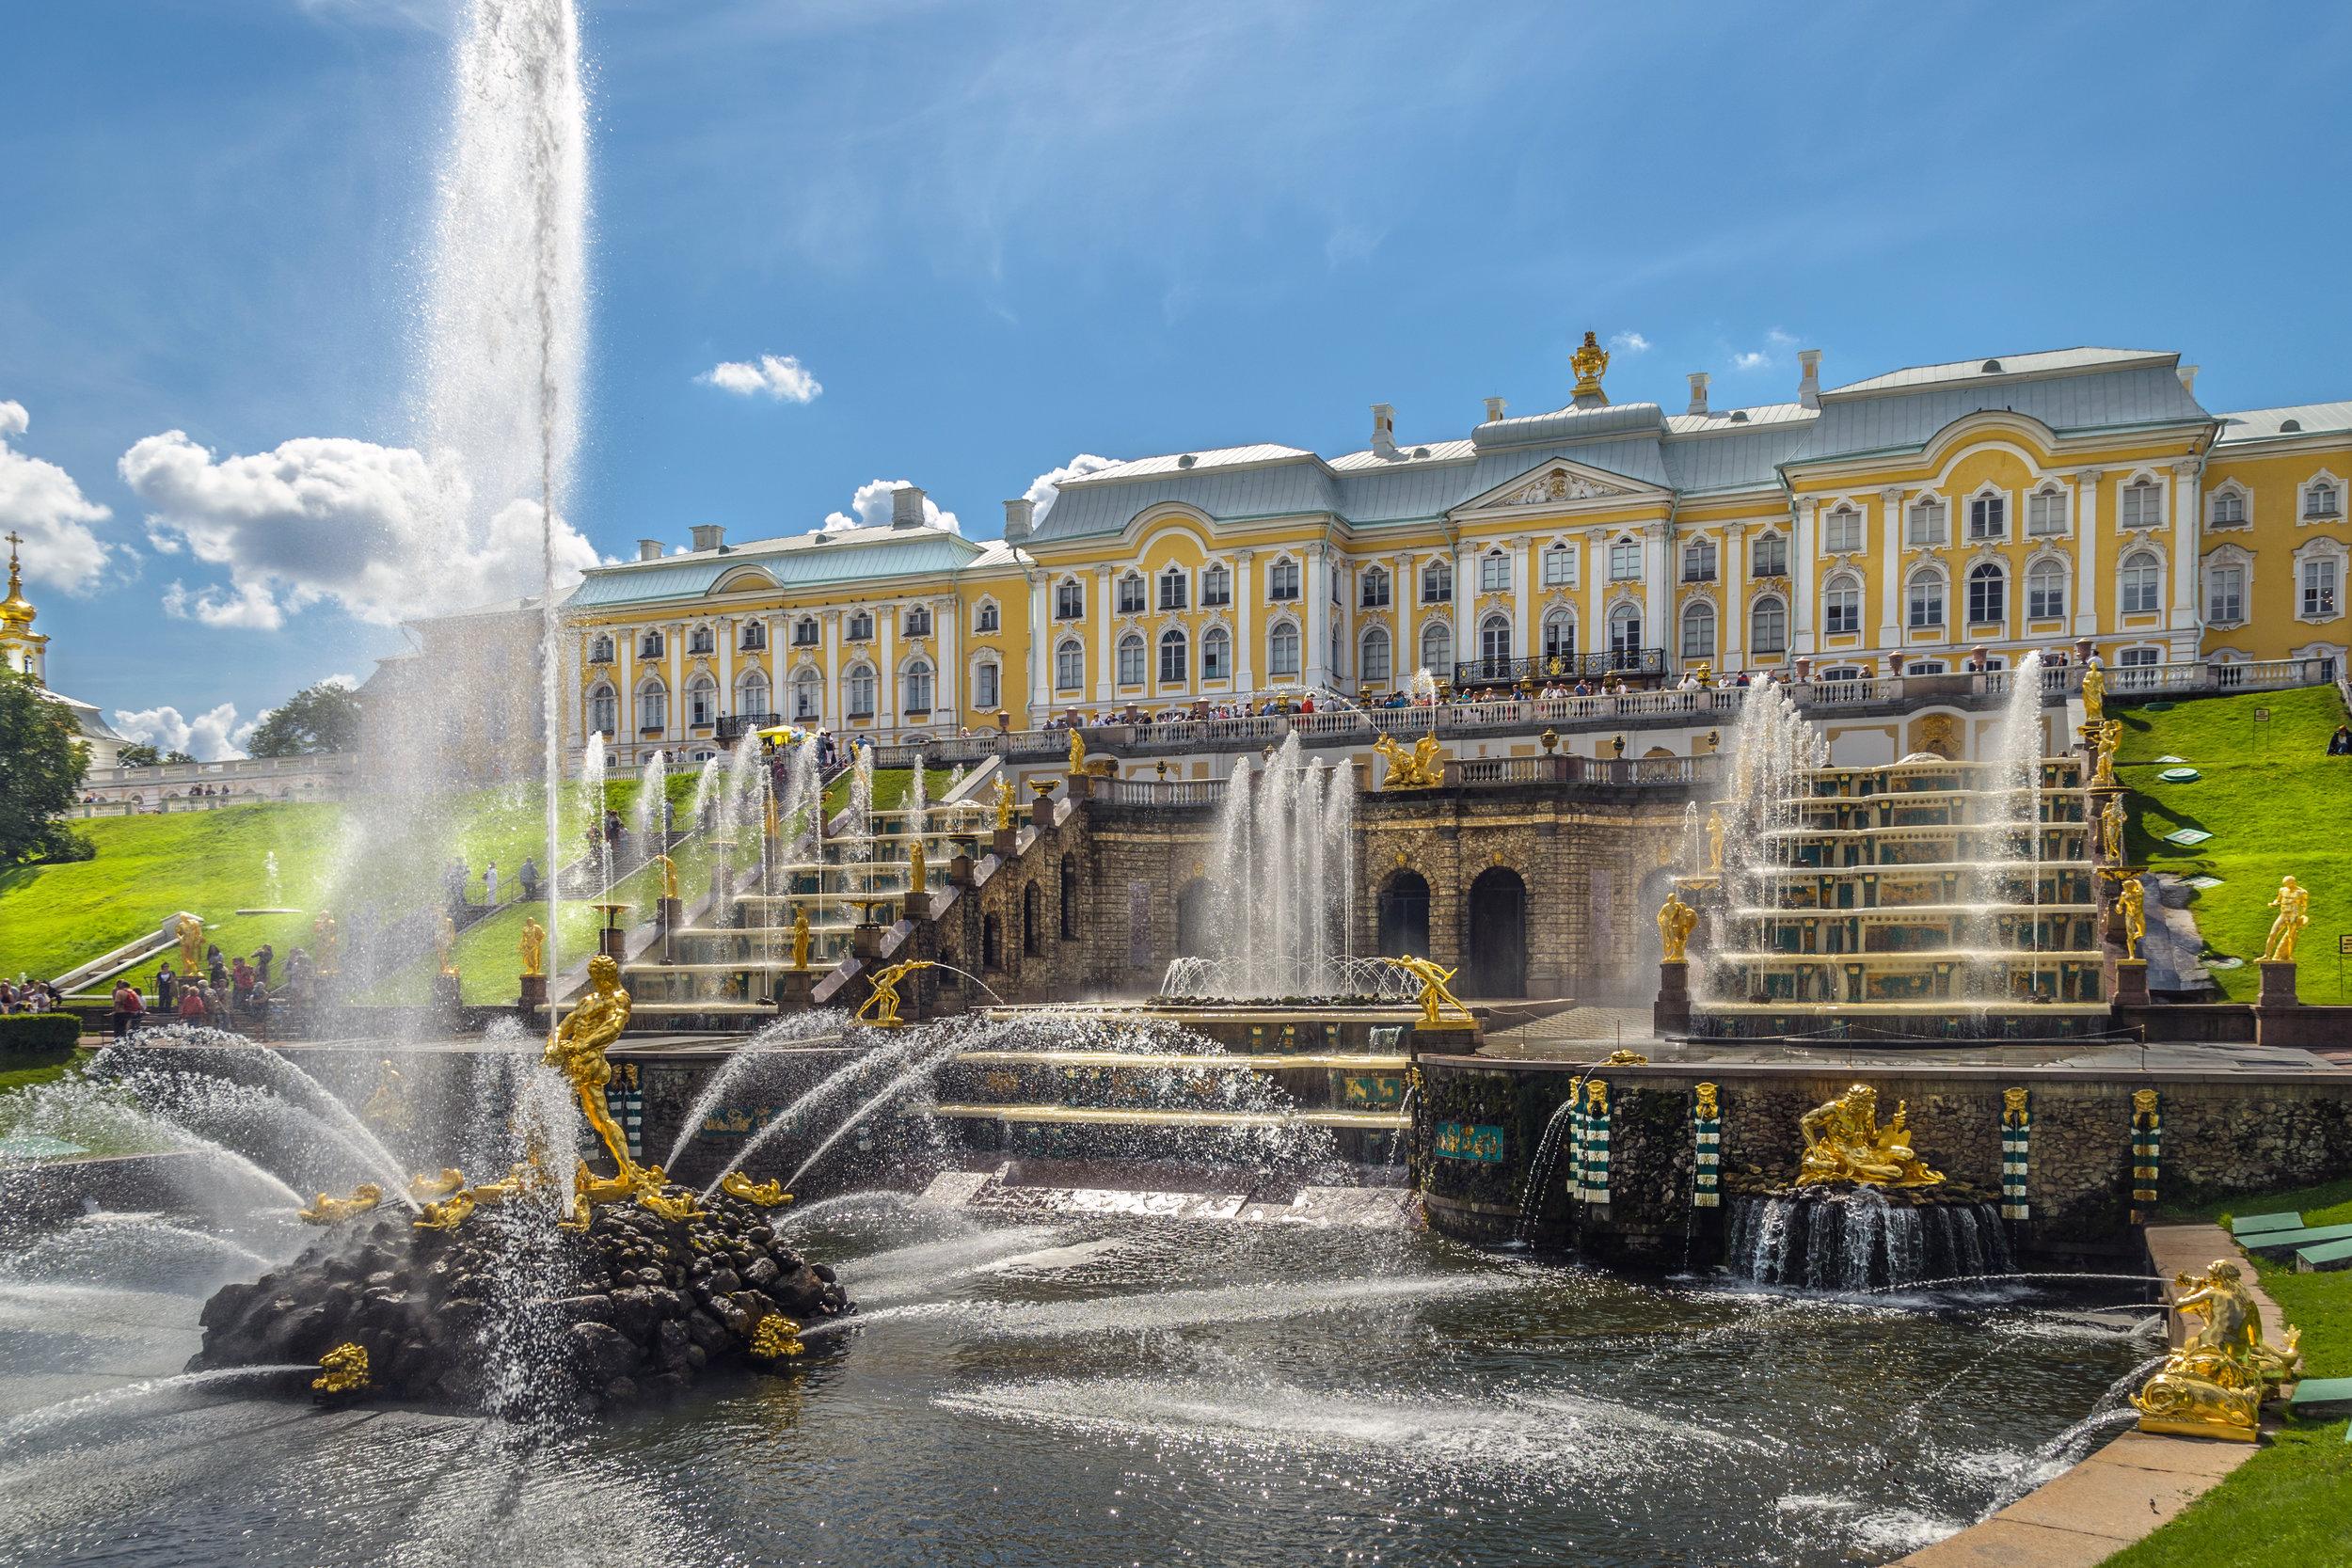 Grand_Cascade_in_Peterhof_01.jpg